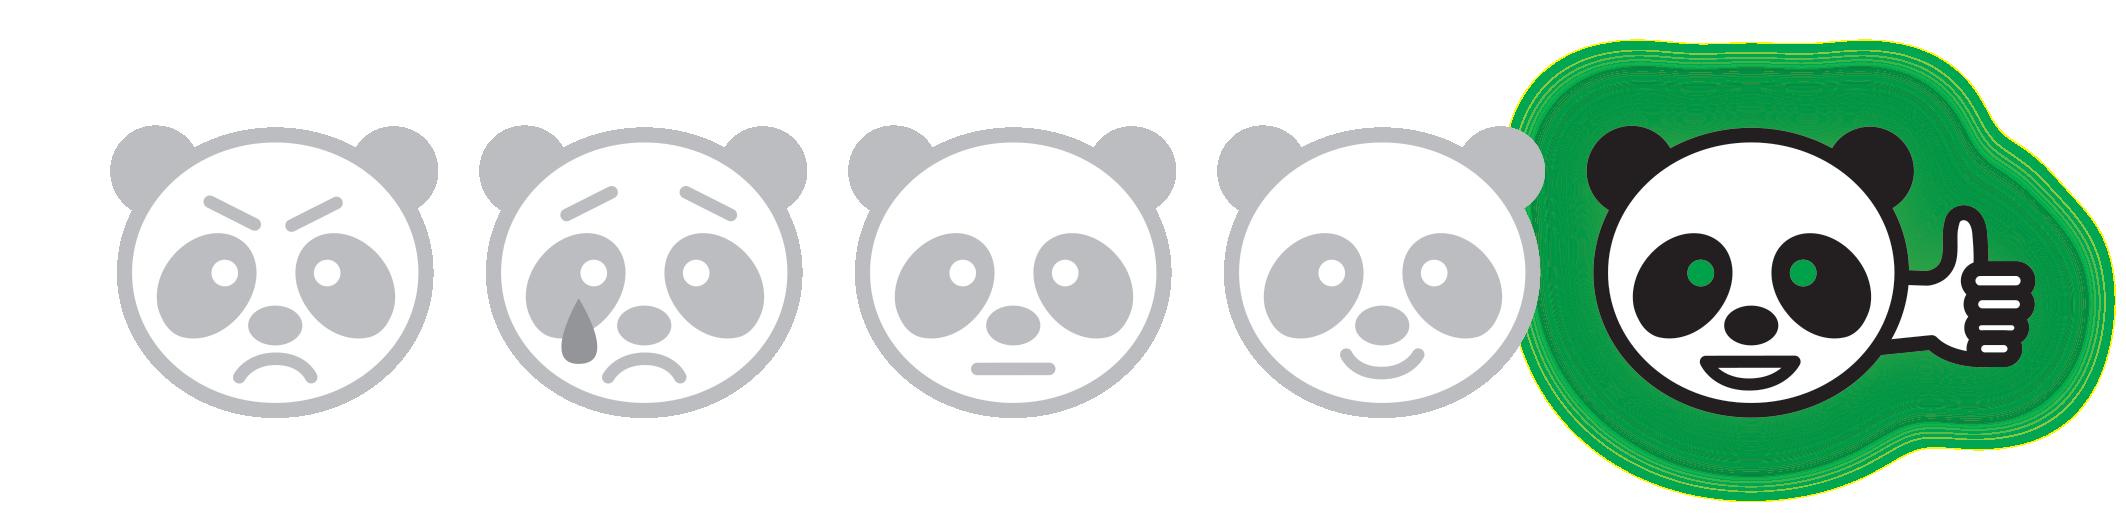 Panda_Emoji_Godkendt